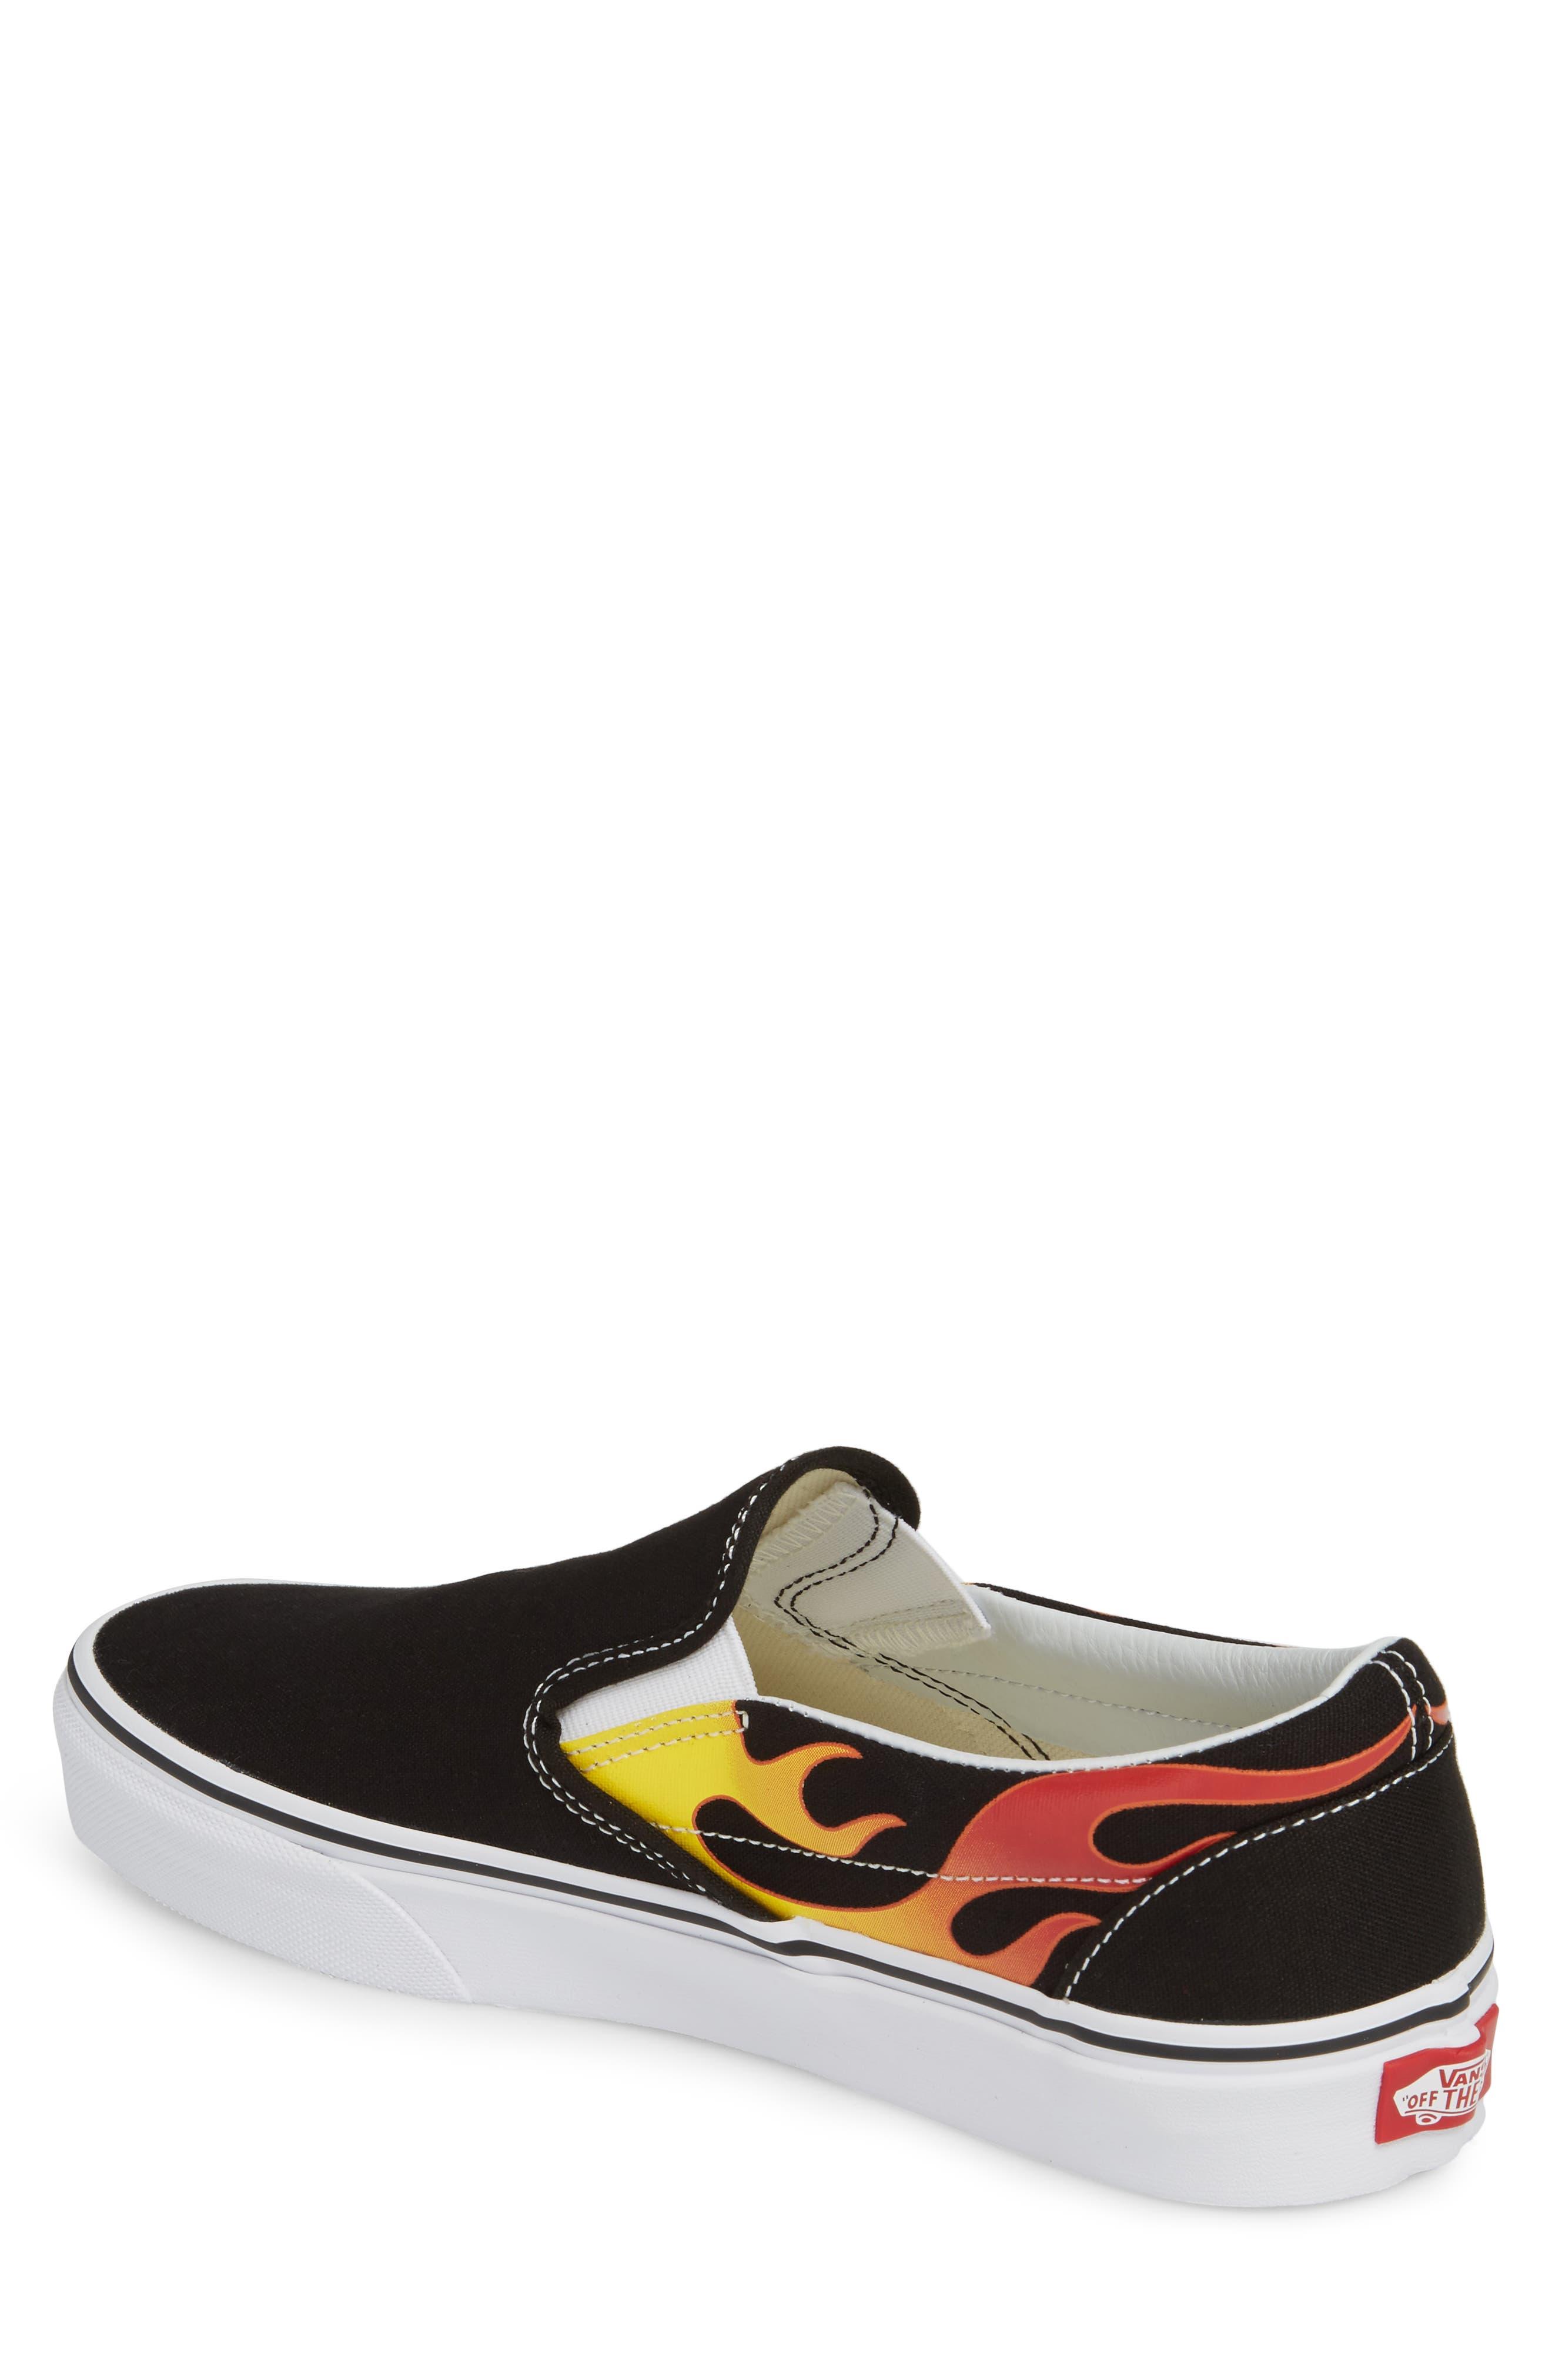 UA Classic Slip-On Sneaker,                             Alternate thumbnail 2, color,                             Black/ Black/ True White